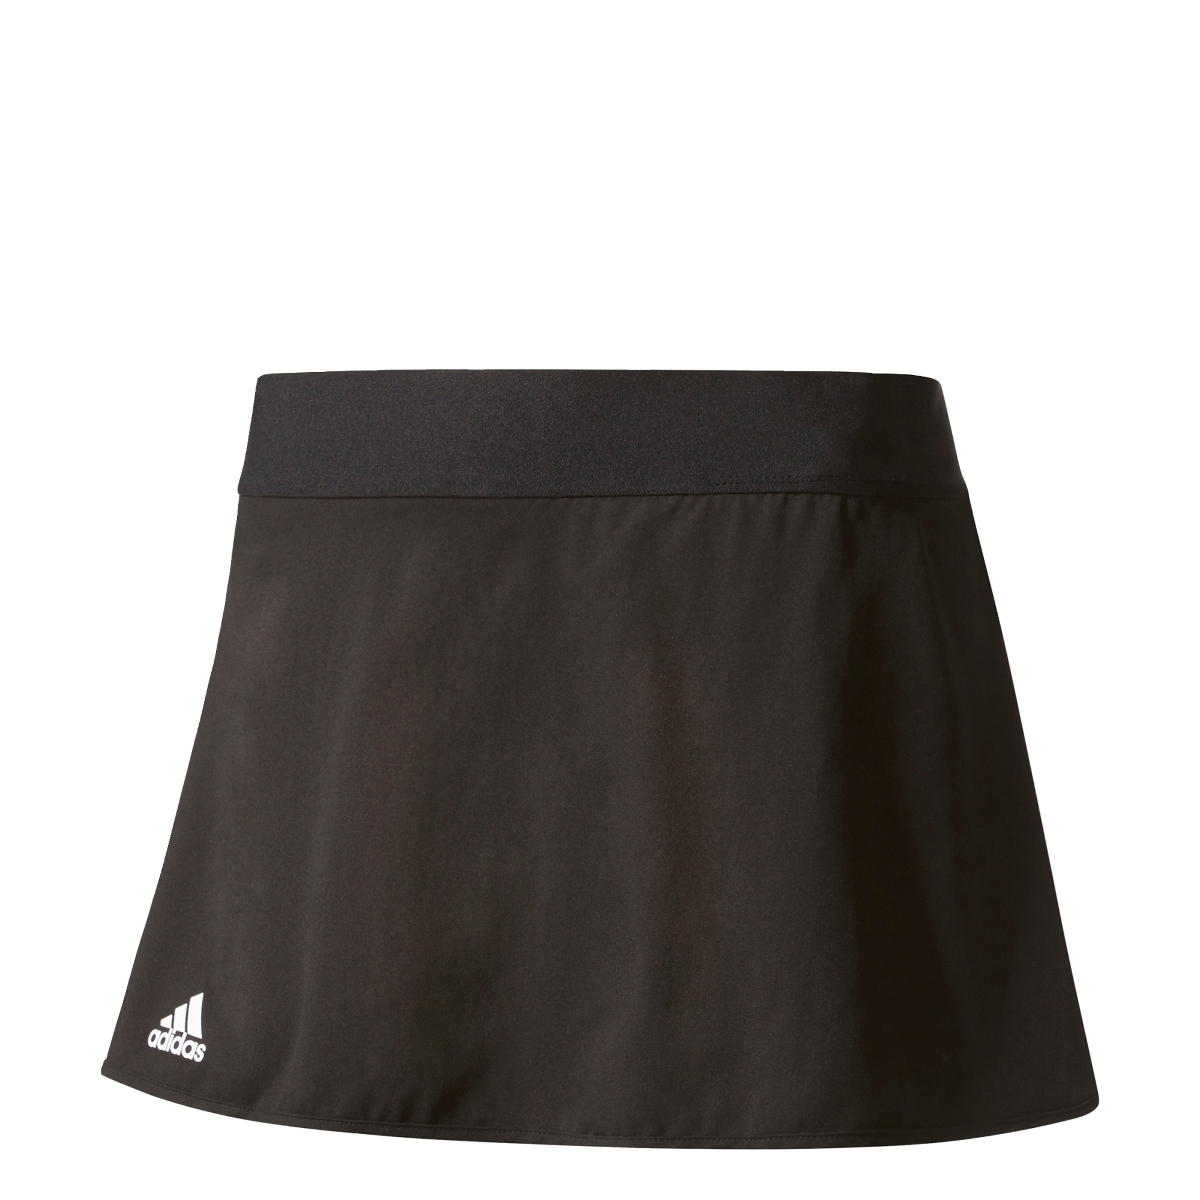 aac872097a7e ADIDAS Women's Club Tennis Skirt - Bob's Stores